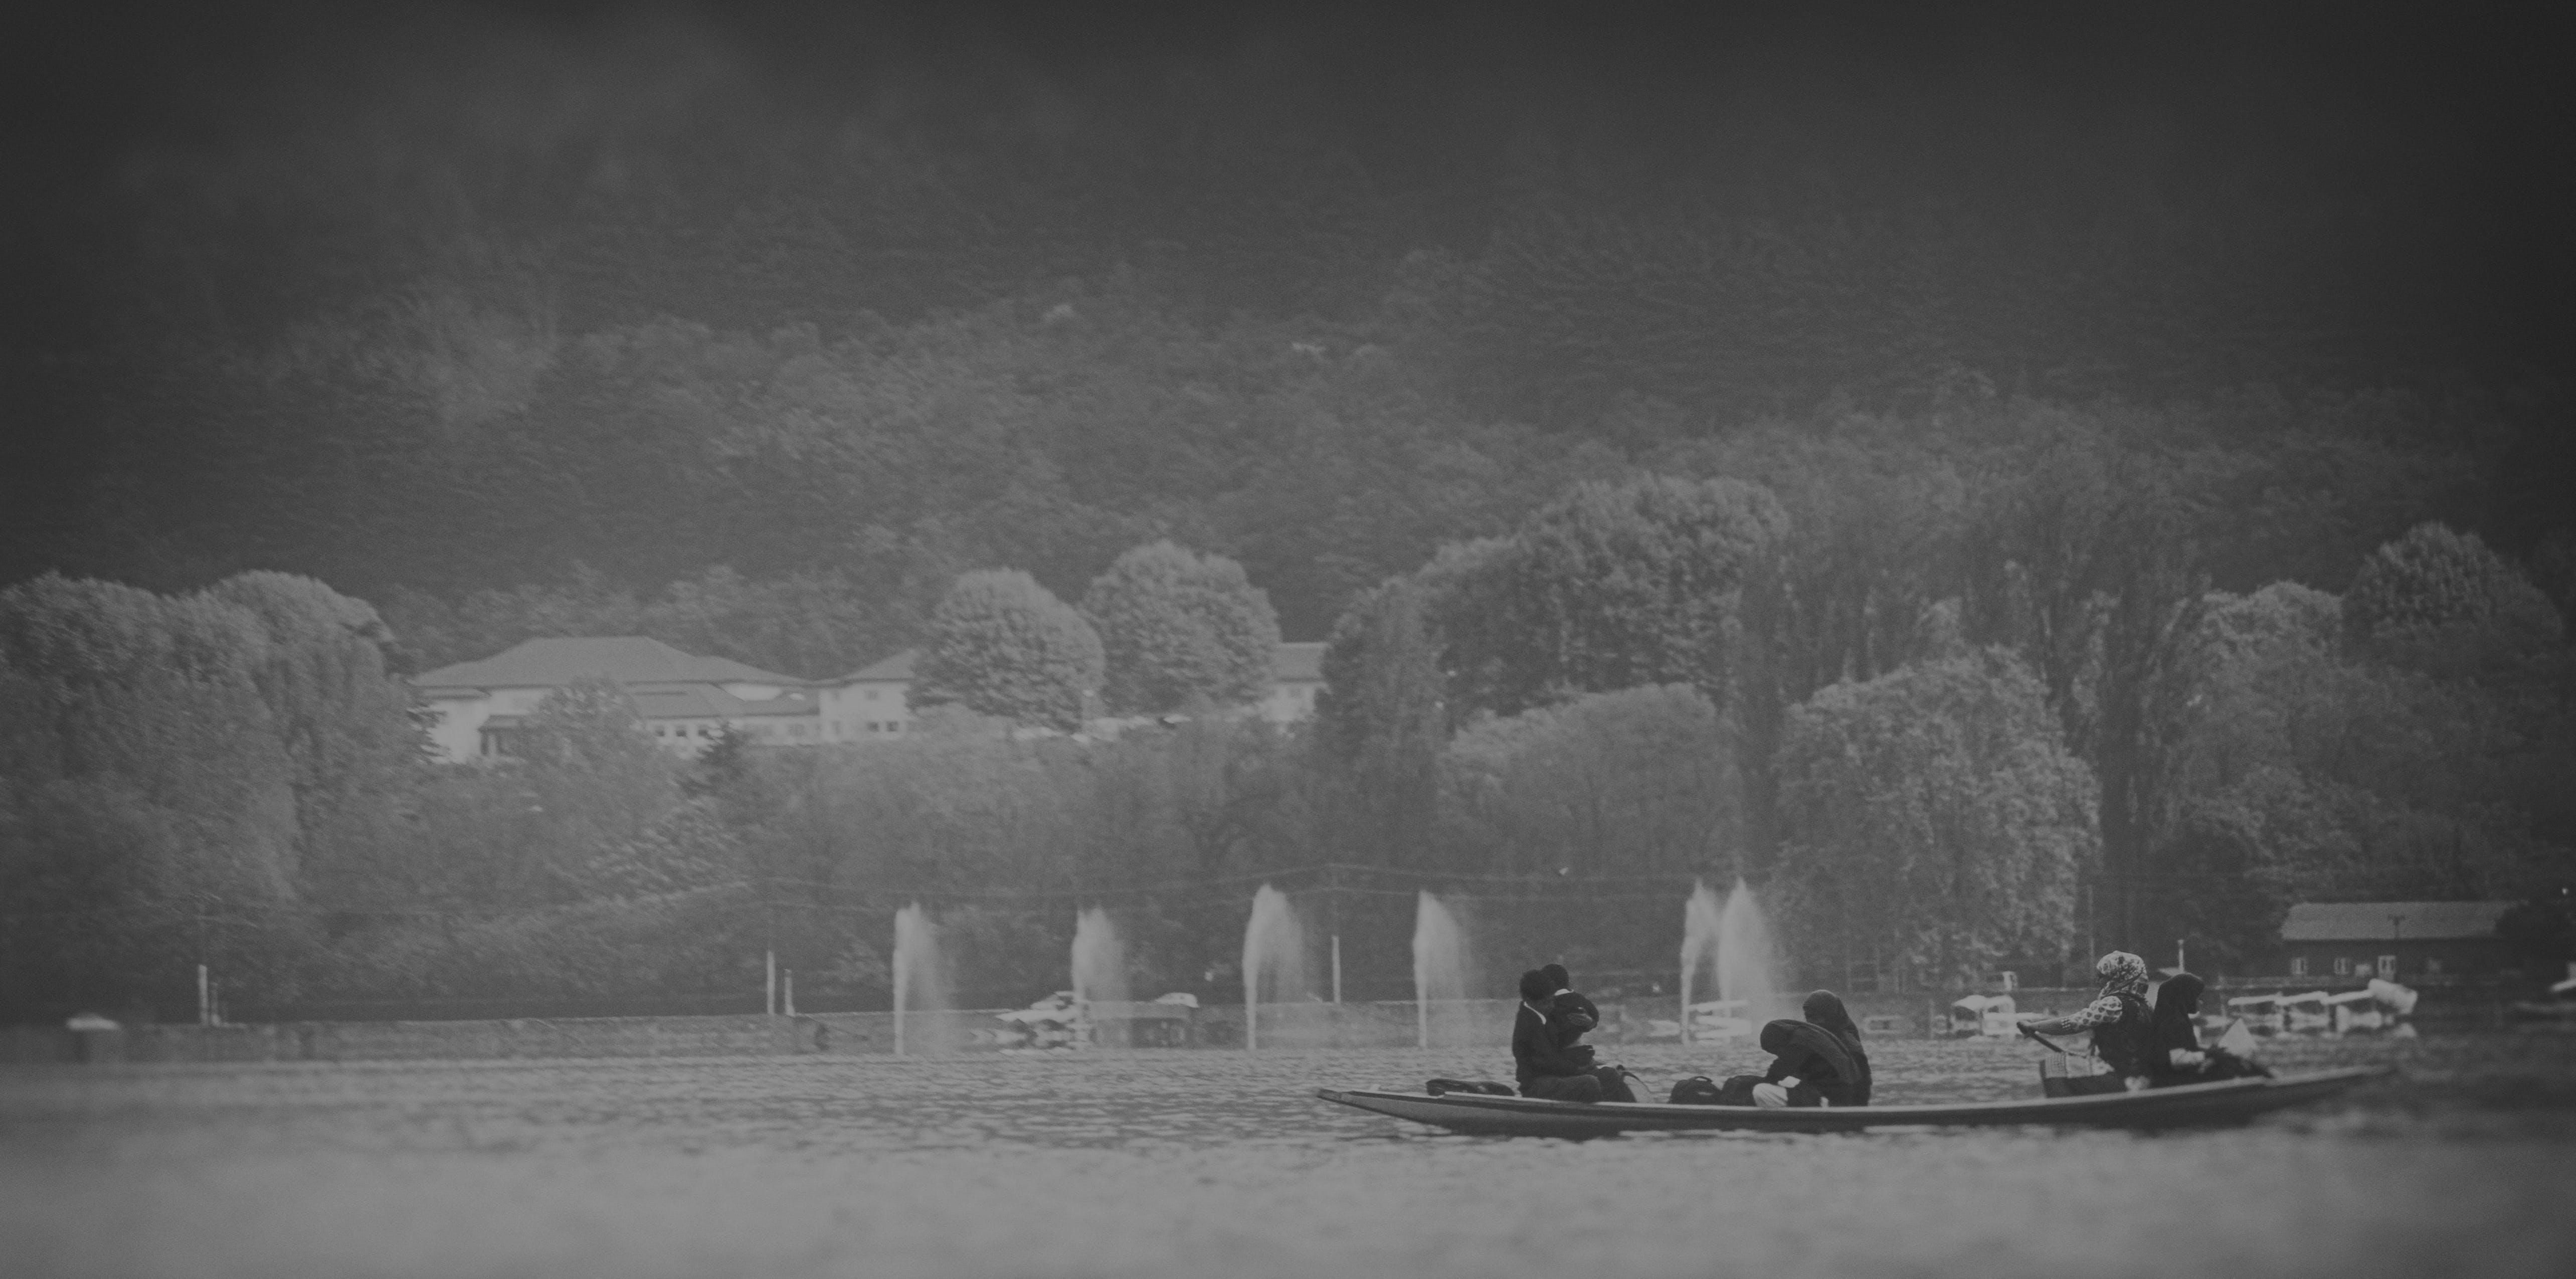 Free stock photo of black and white, boat, lake, monochrome photography